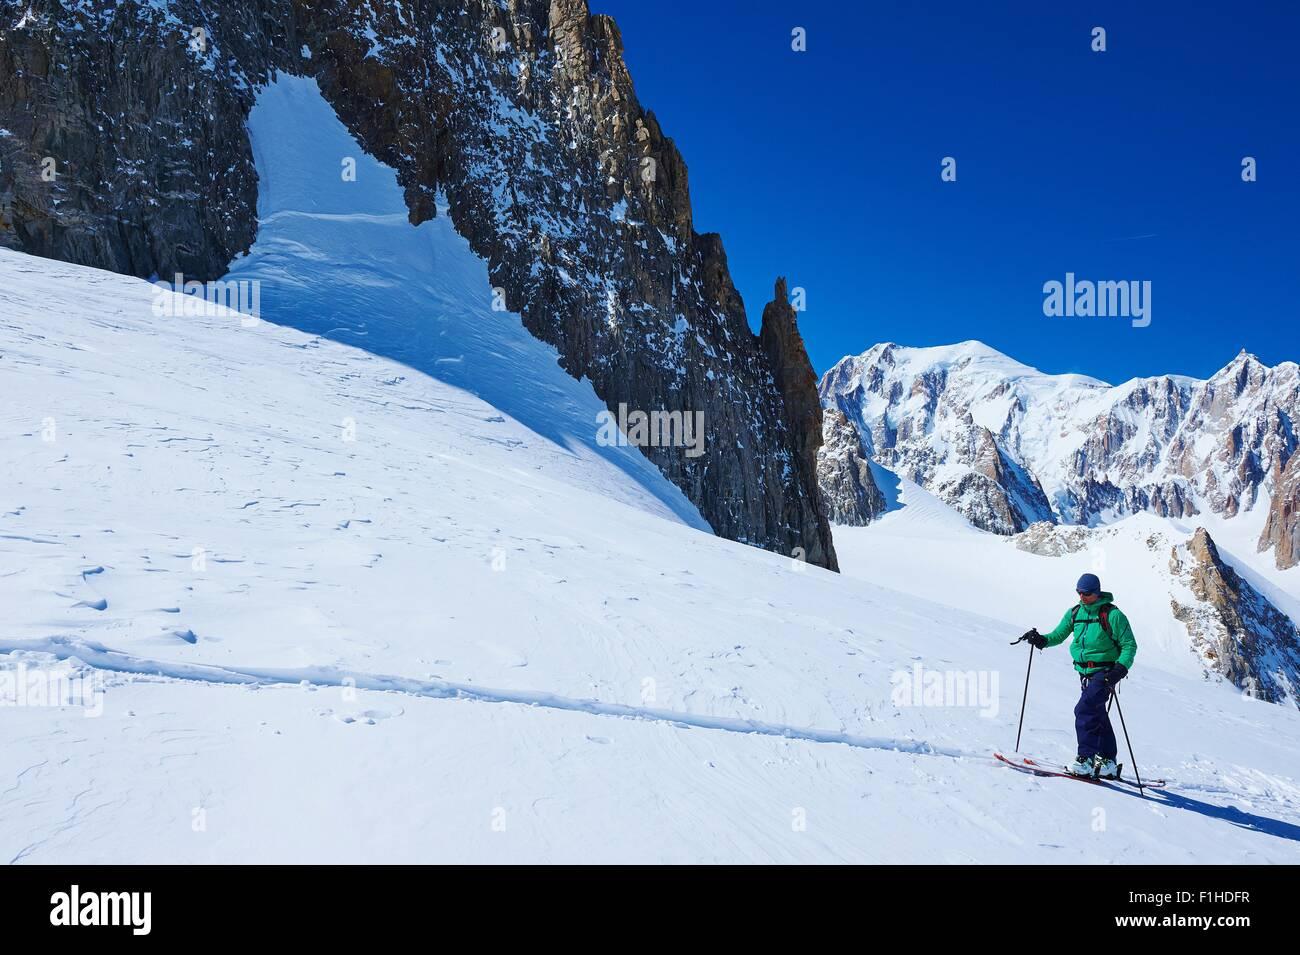 Macho maduro esquiador subiendo Graian macizo del Mont Blanc, Alpes, Francia Imagen De Stock